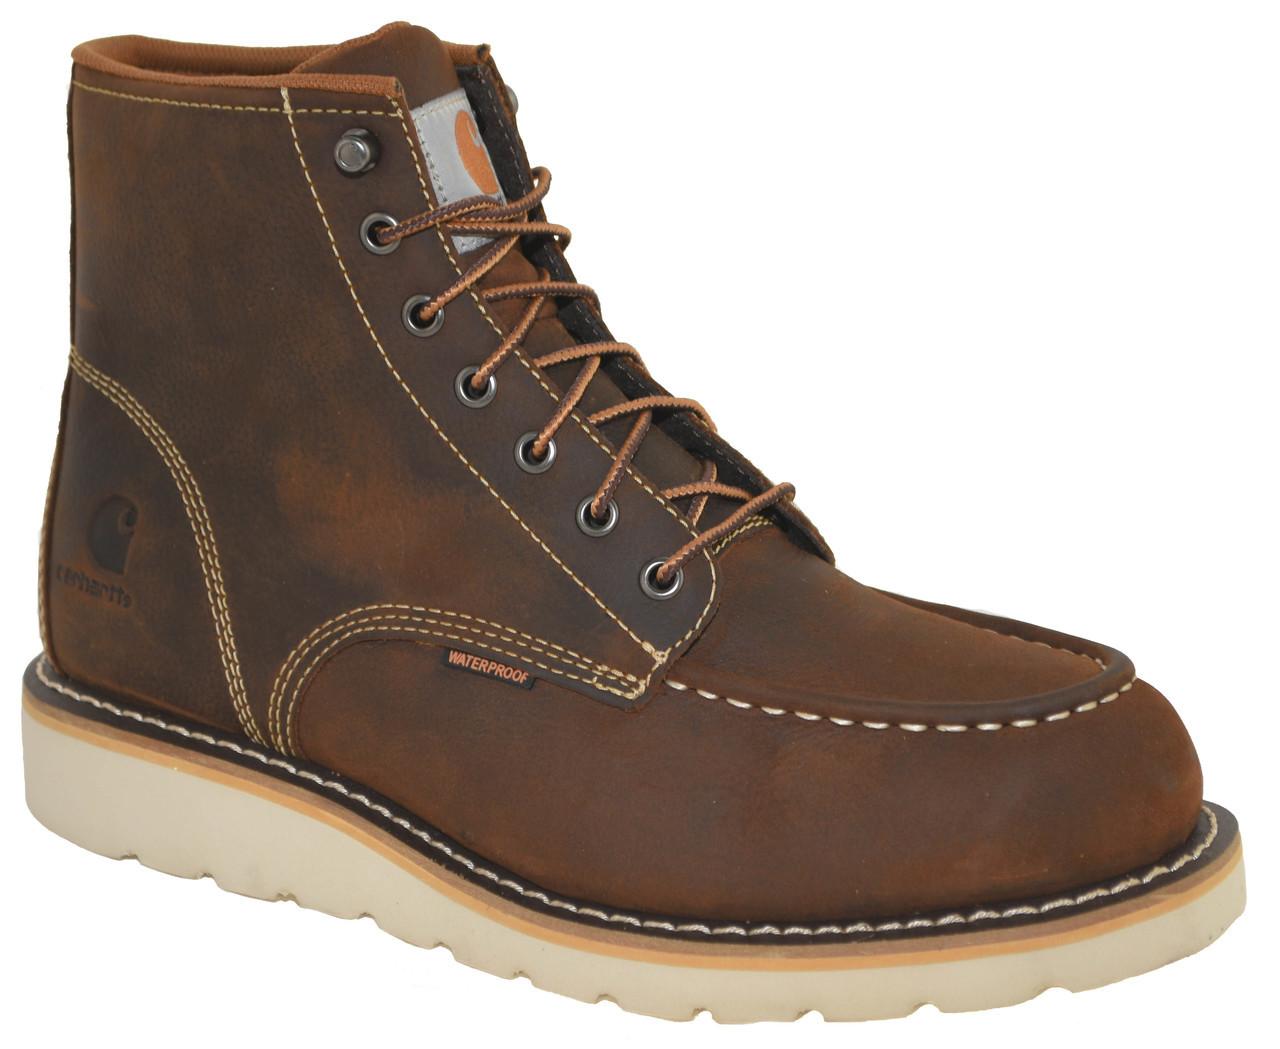 Carhartt Men's CMW6095 Moc Toe